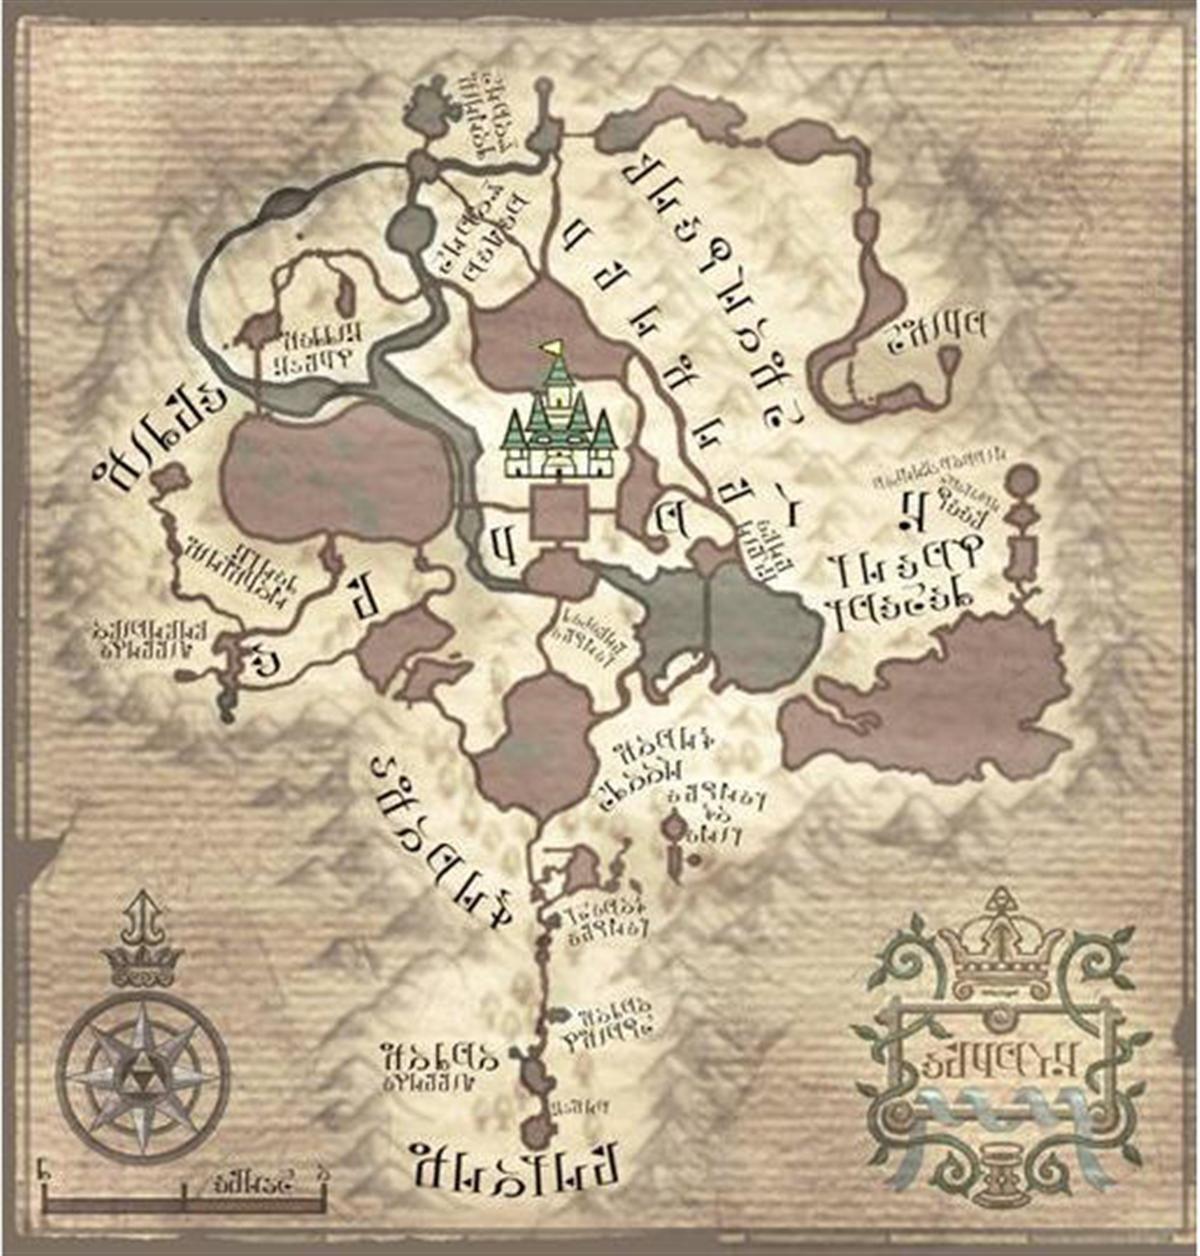 legend of zelda twilight princess hyrule map nintendo wii